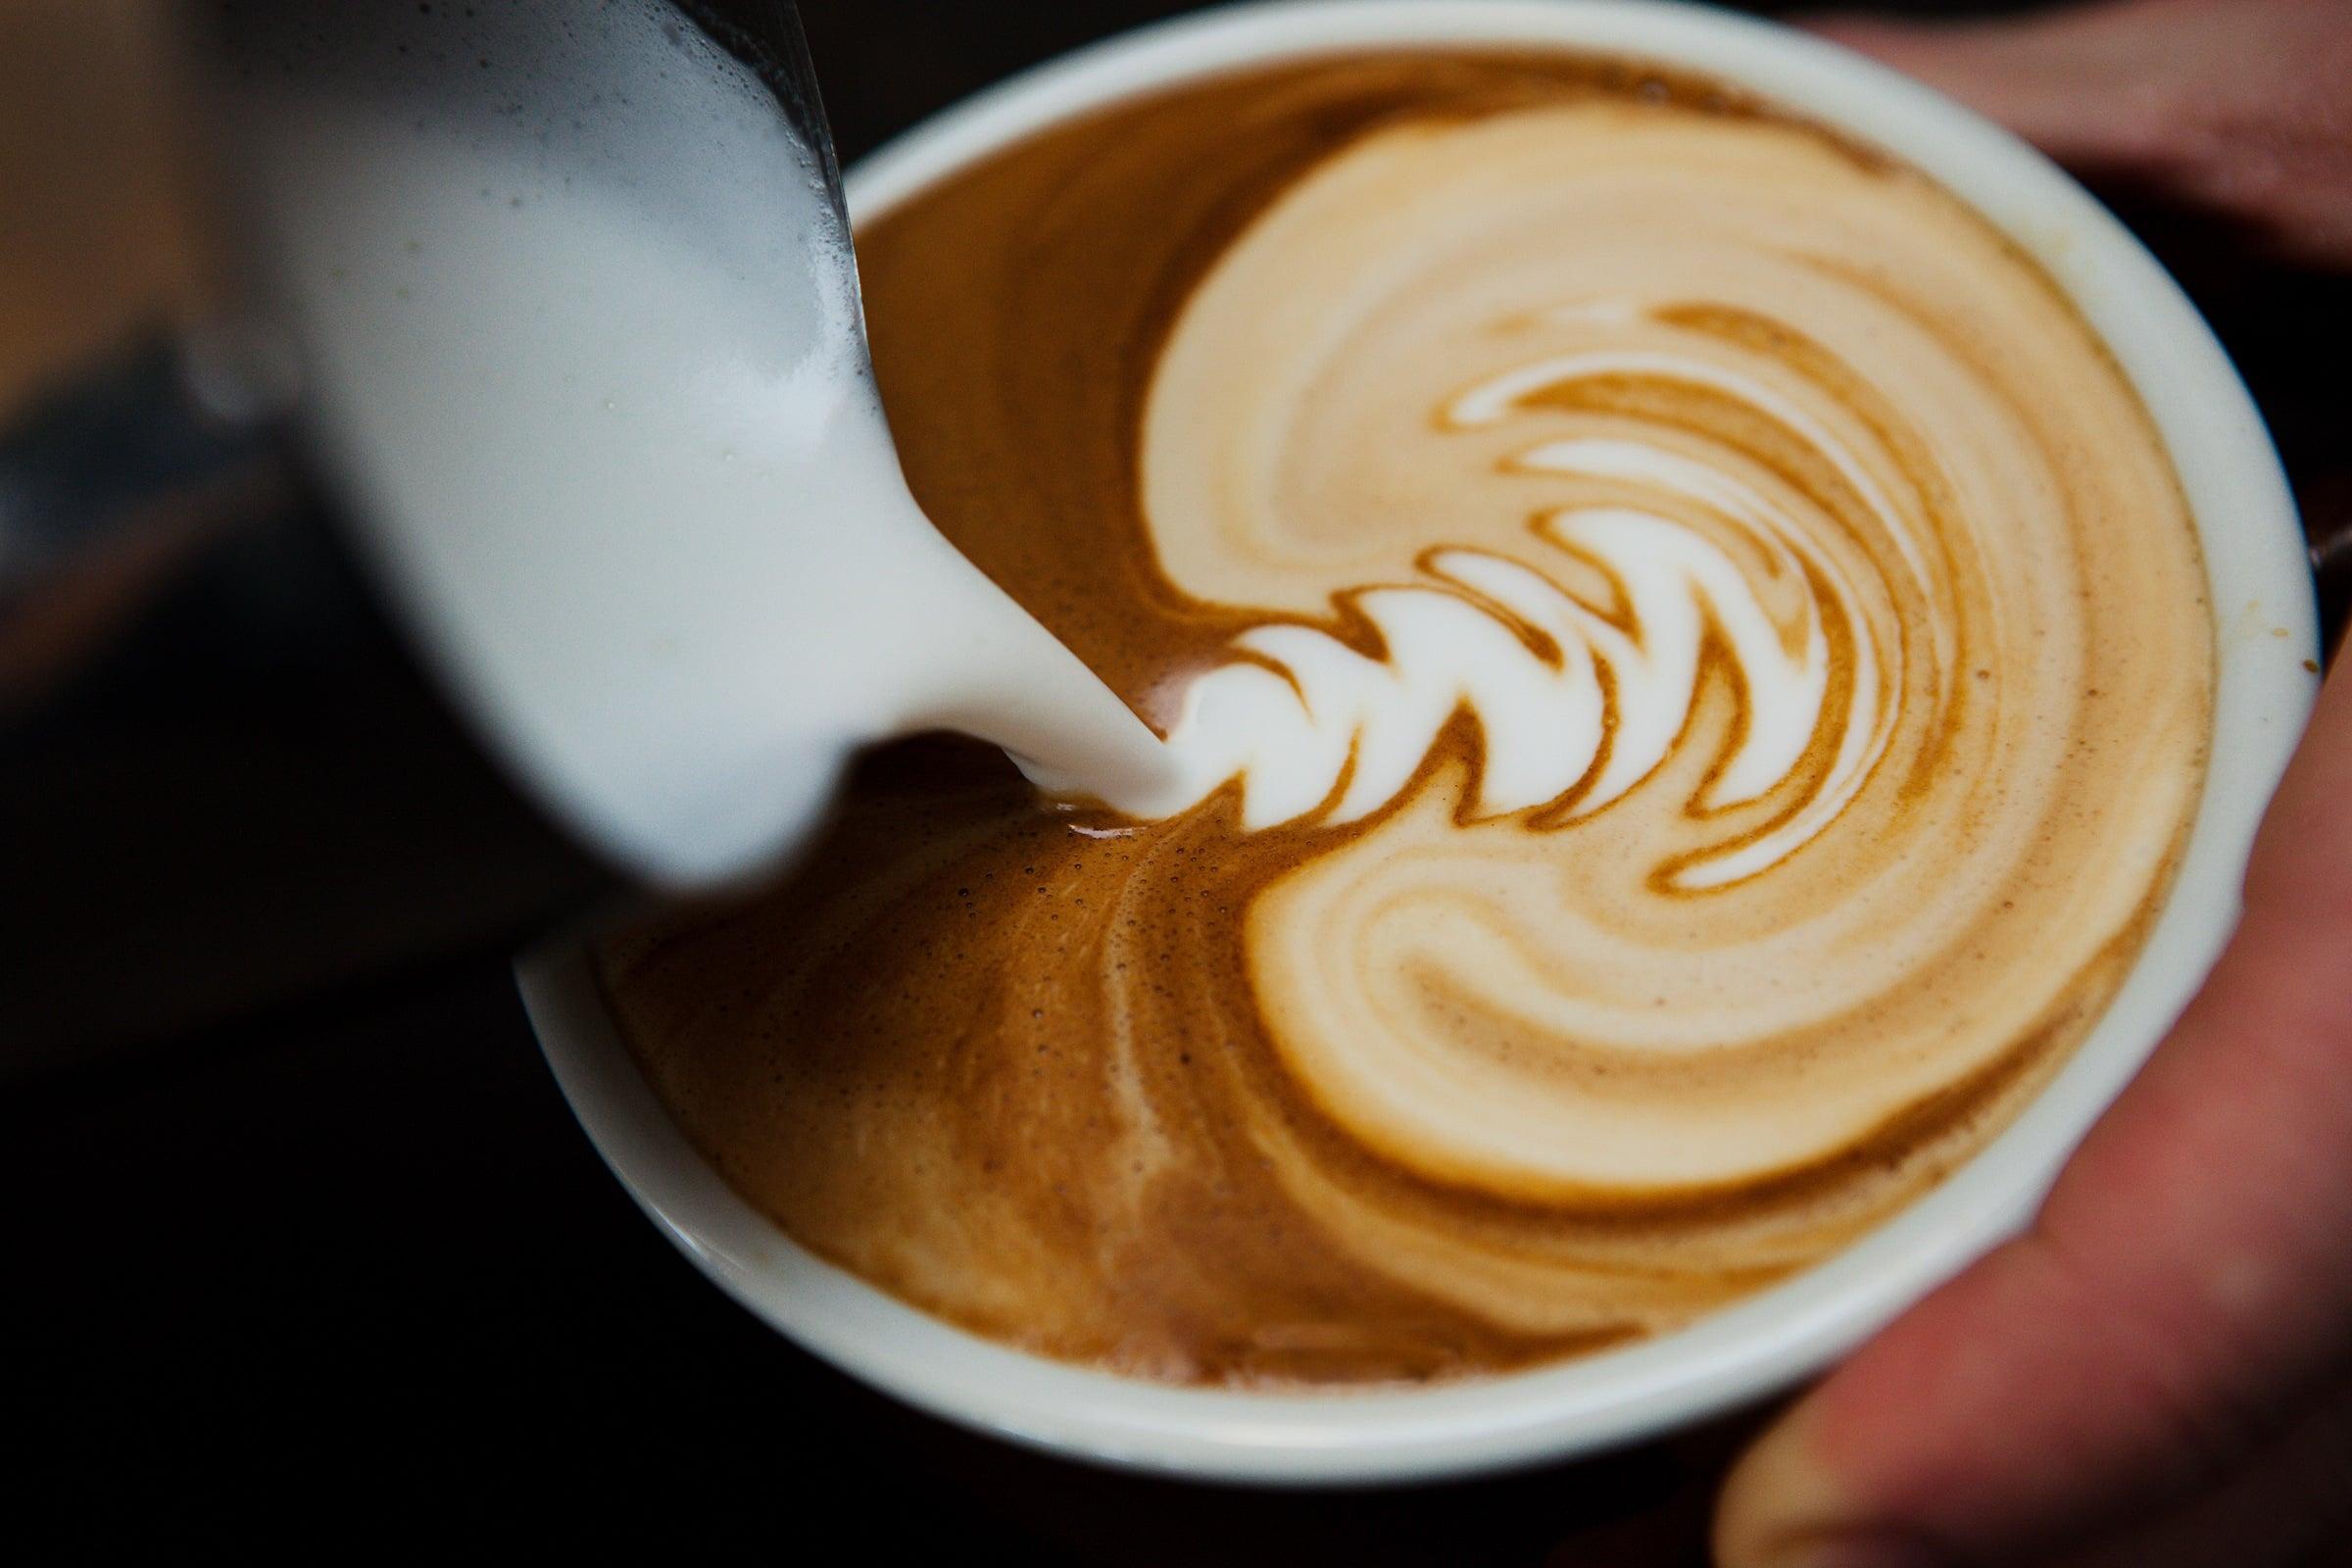 A £3 coffee